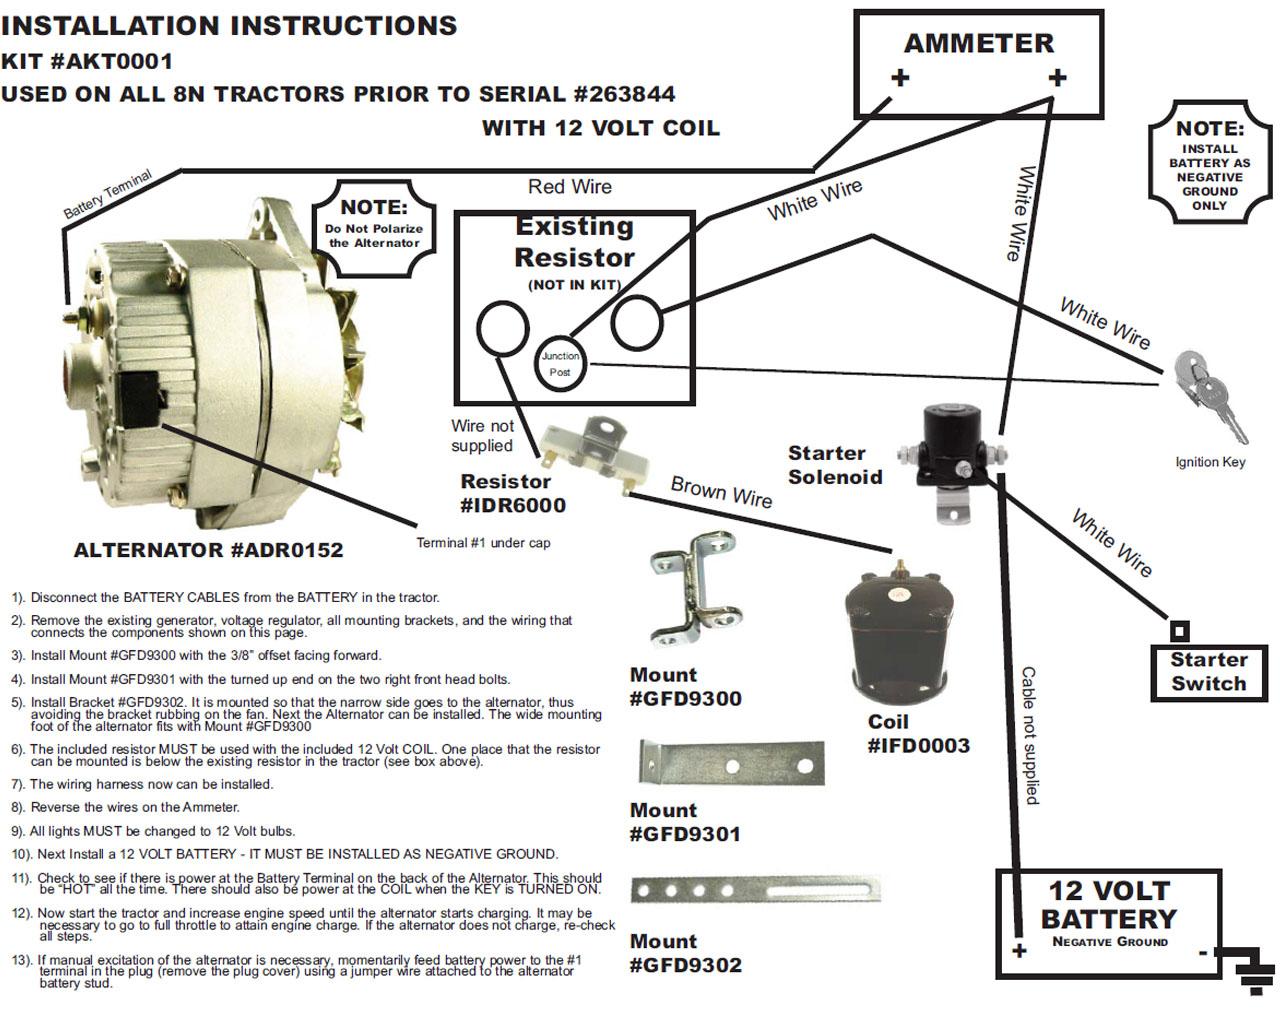 12 Volt Conversion Wiring Diagram For Ferguson   Manual E-Books - 6 Volt To 12 Volt Conversion Wiring Diagram